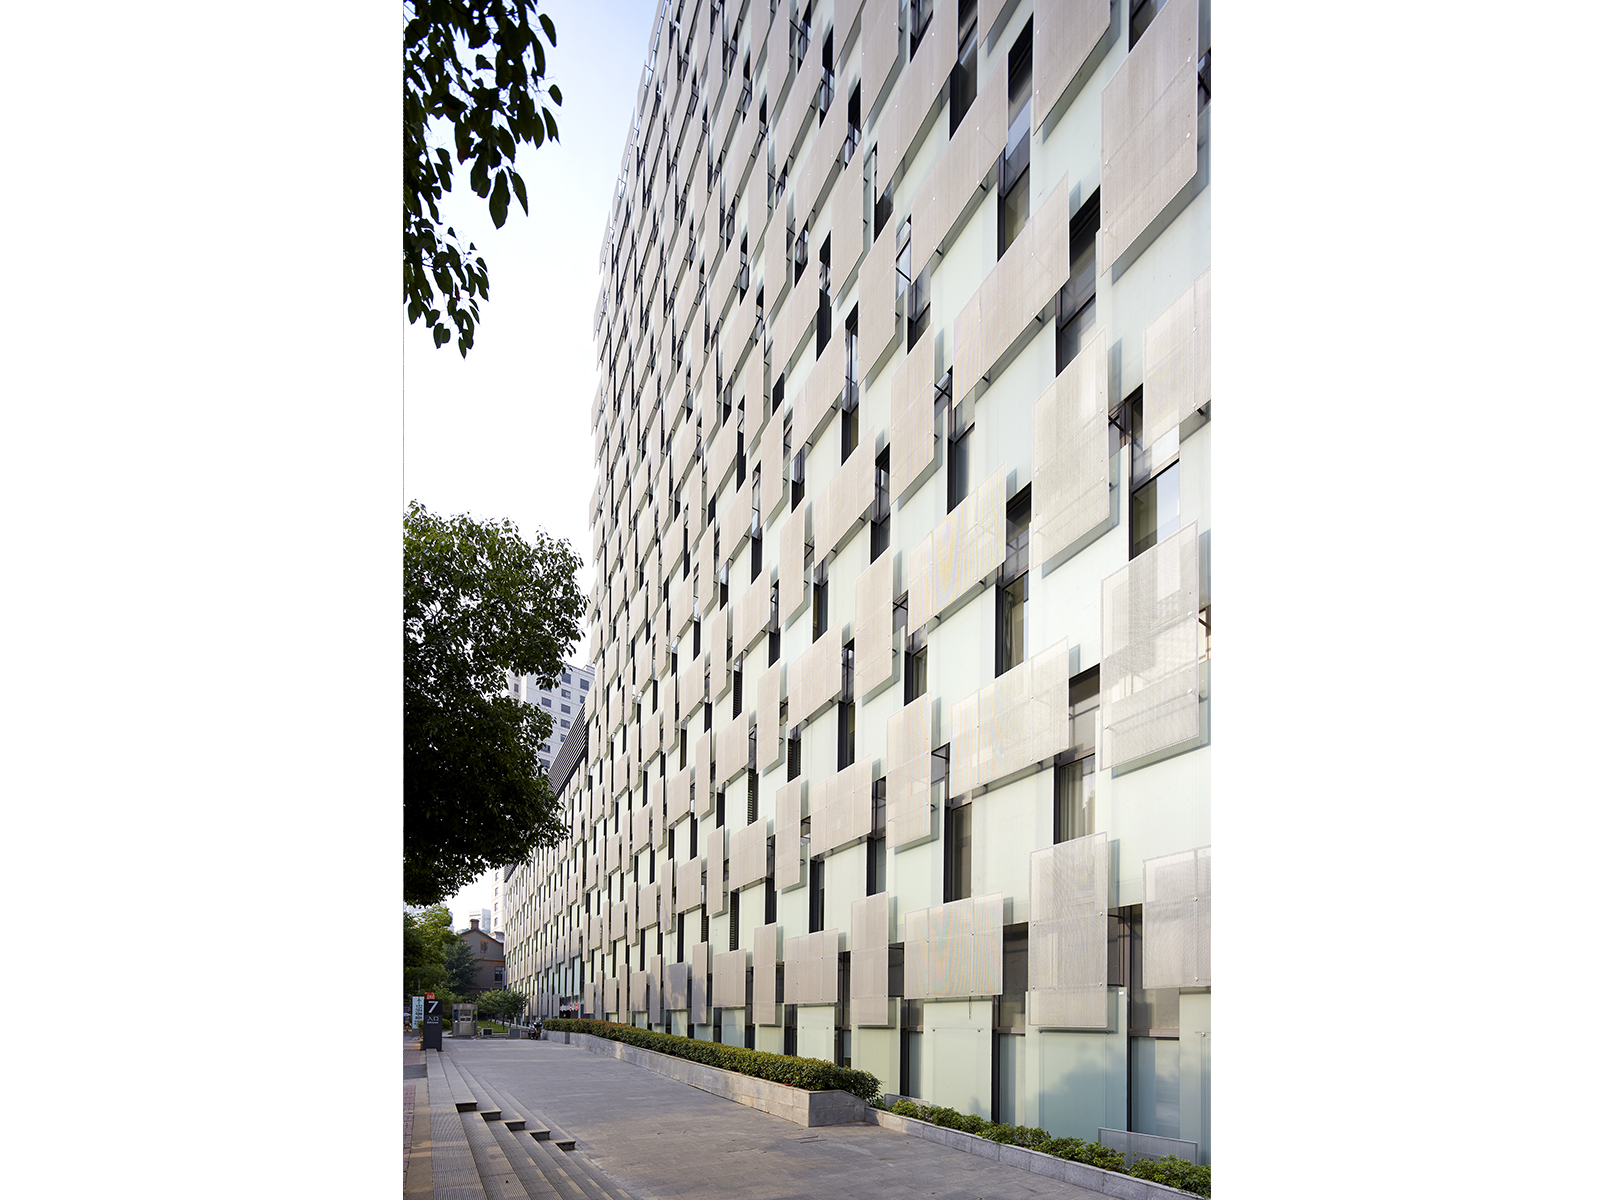 Nanjing-Drum-Tower-Hospital_Right_031.jpg